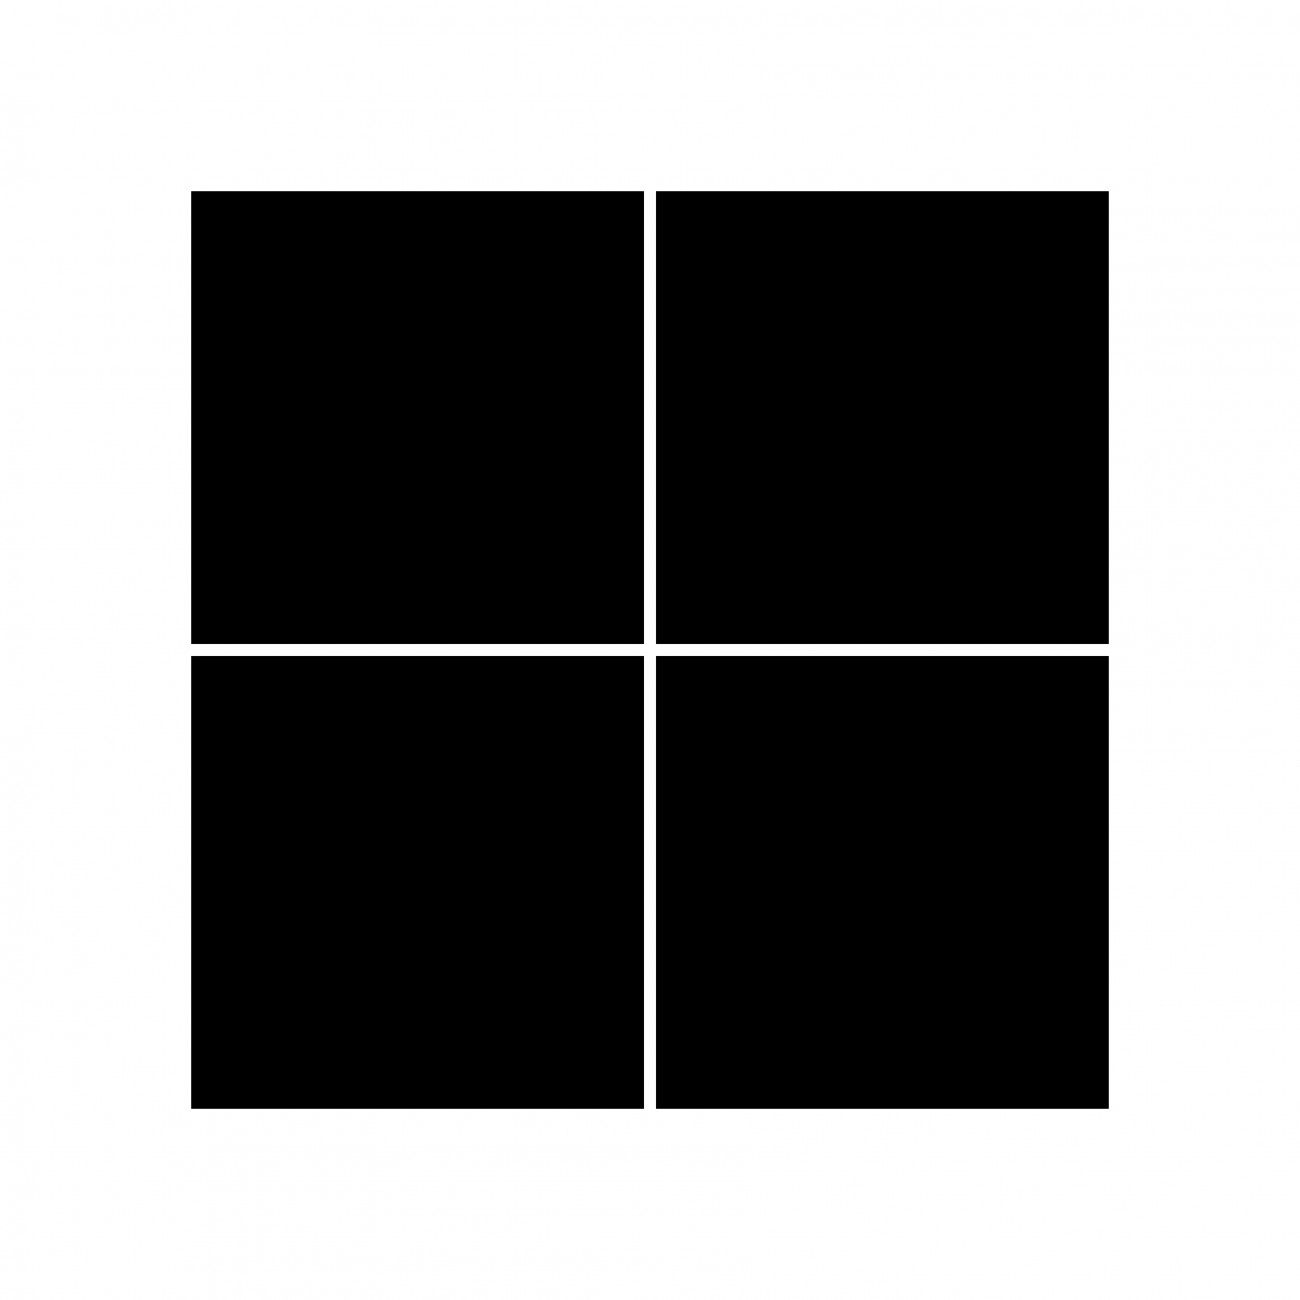 Kvadratisk 04 - 4 bilder